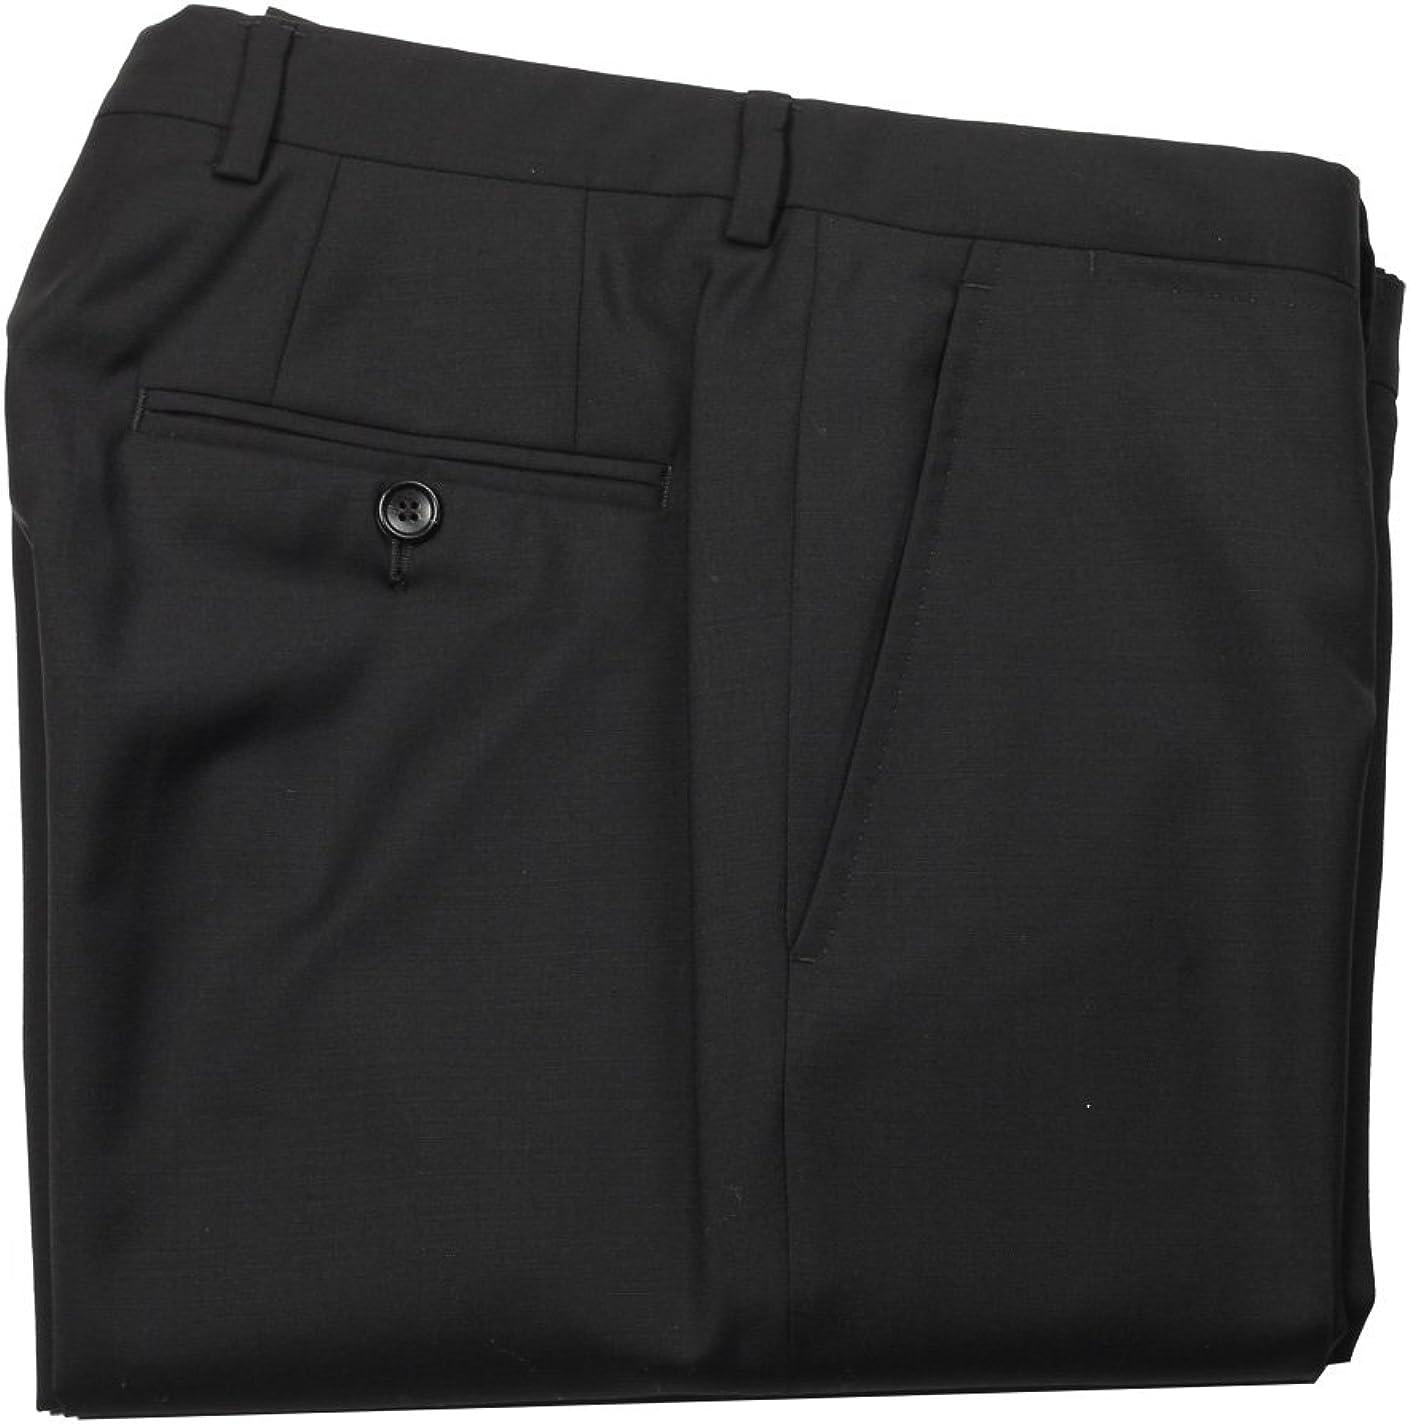 Gucci CL Black Trousers Size 46/30 U.S.